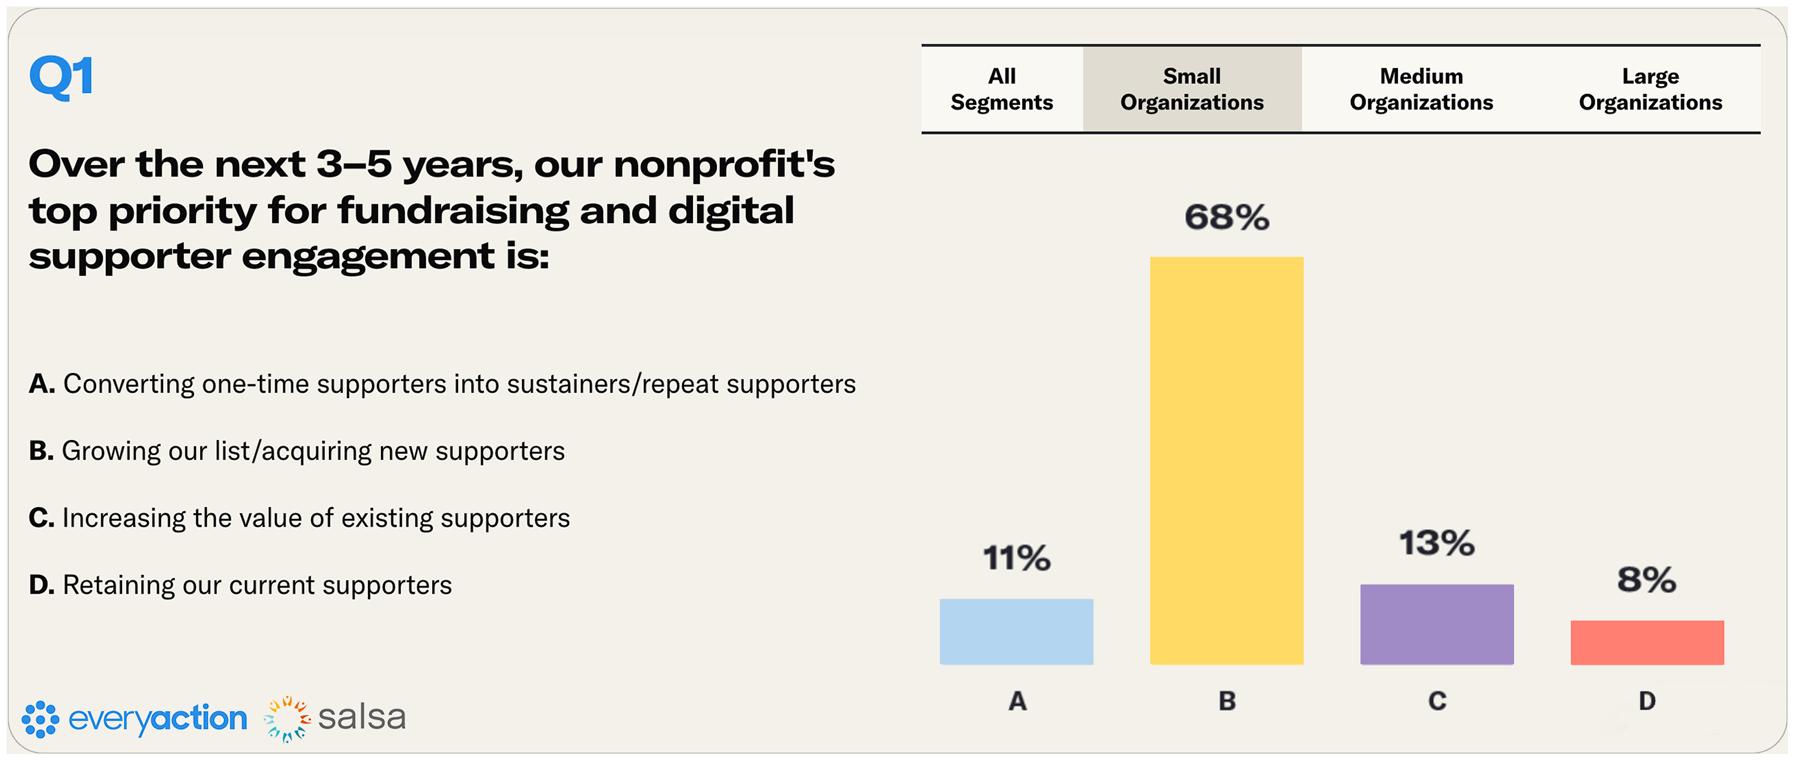 Nonprofit Fundraising Survey Q1 Small Nonprofits Image